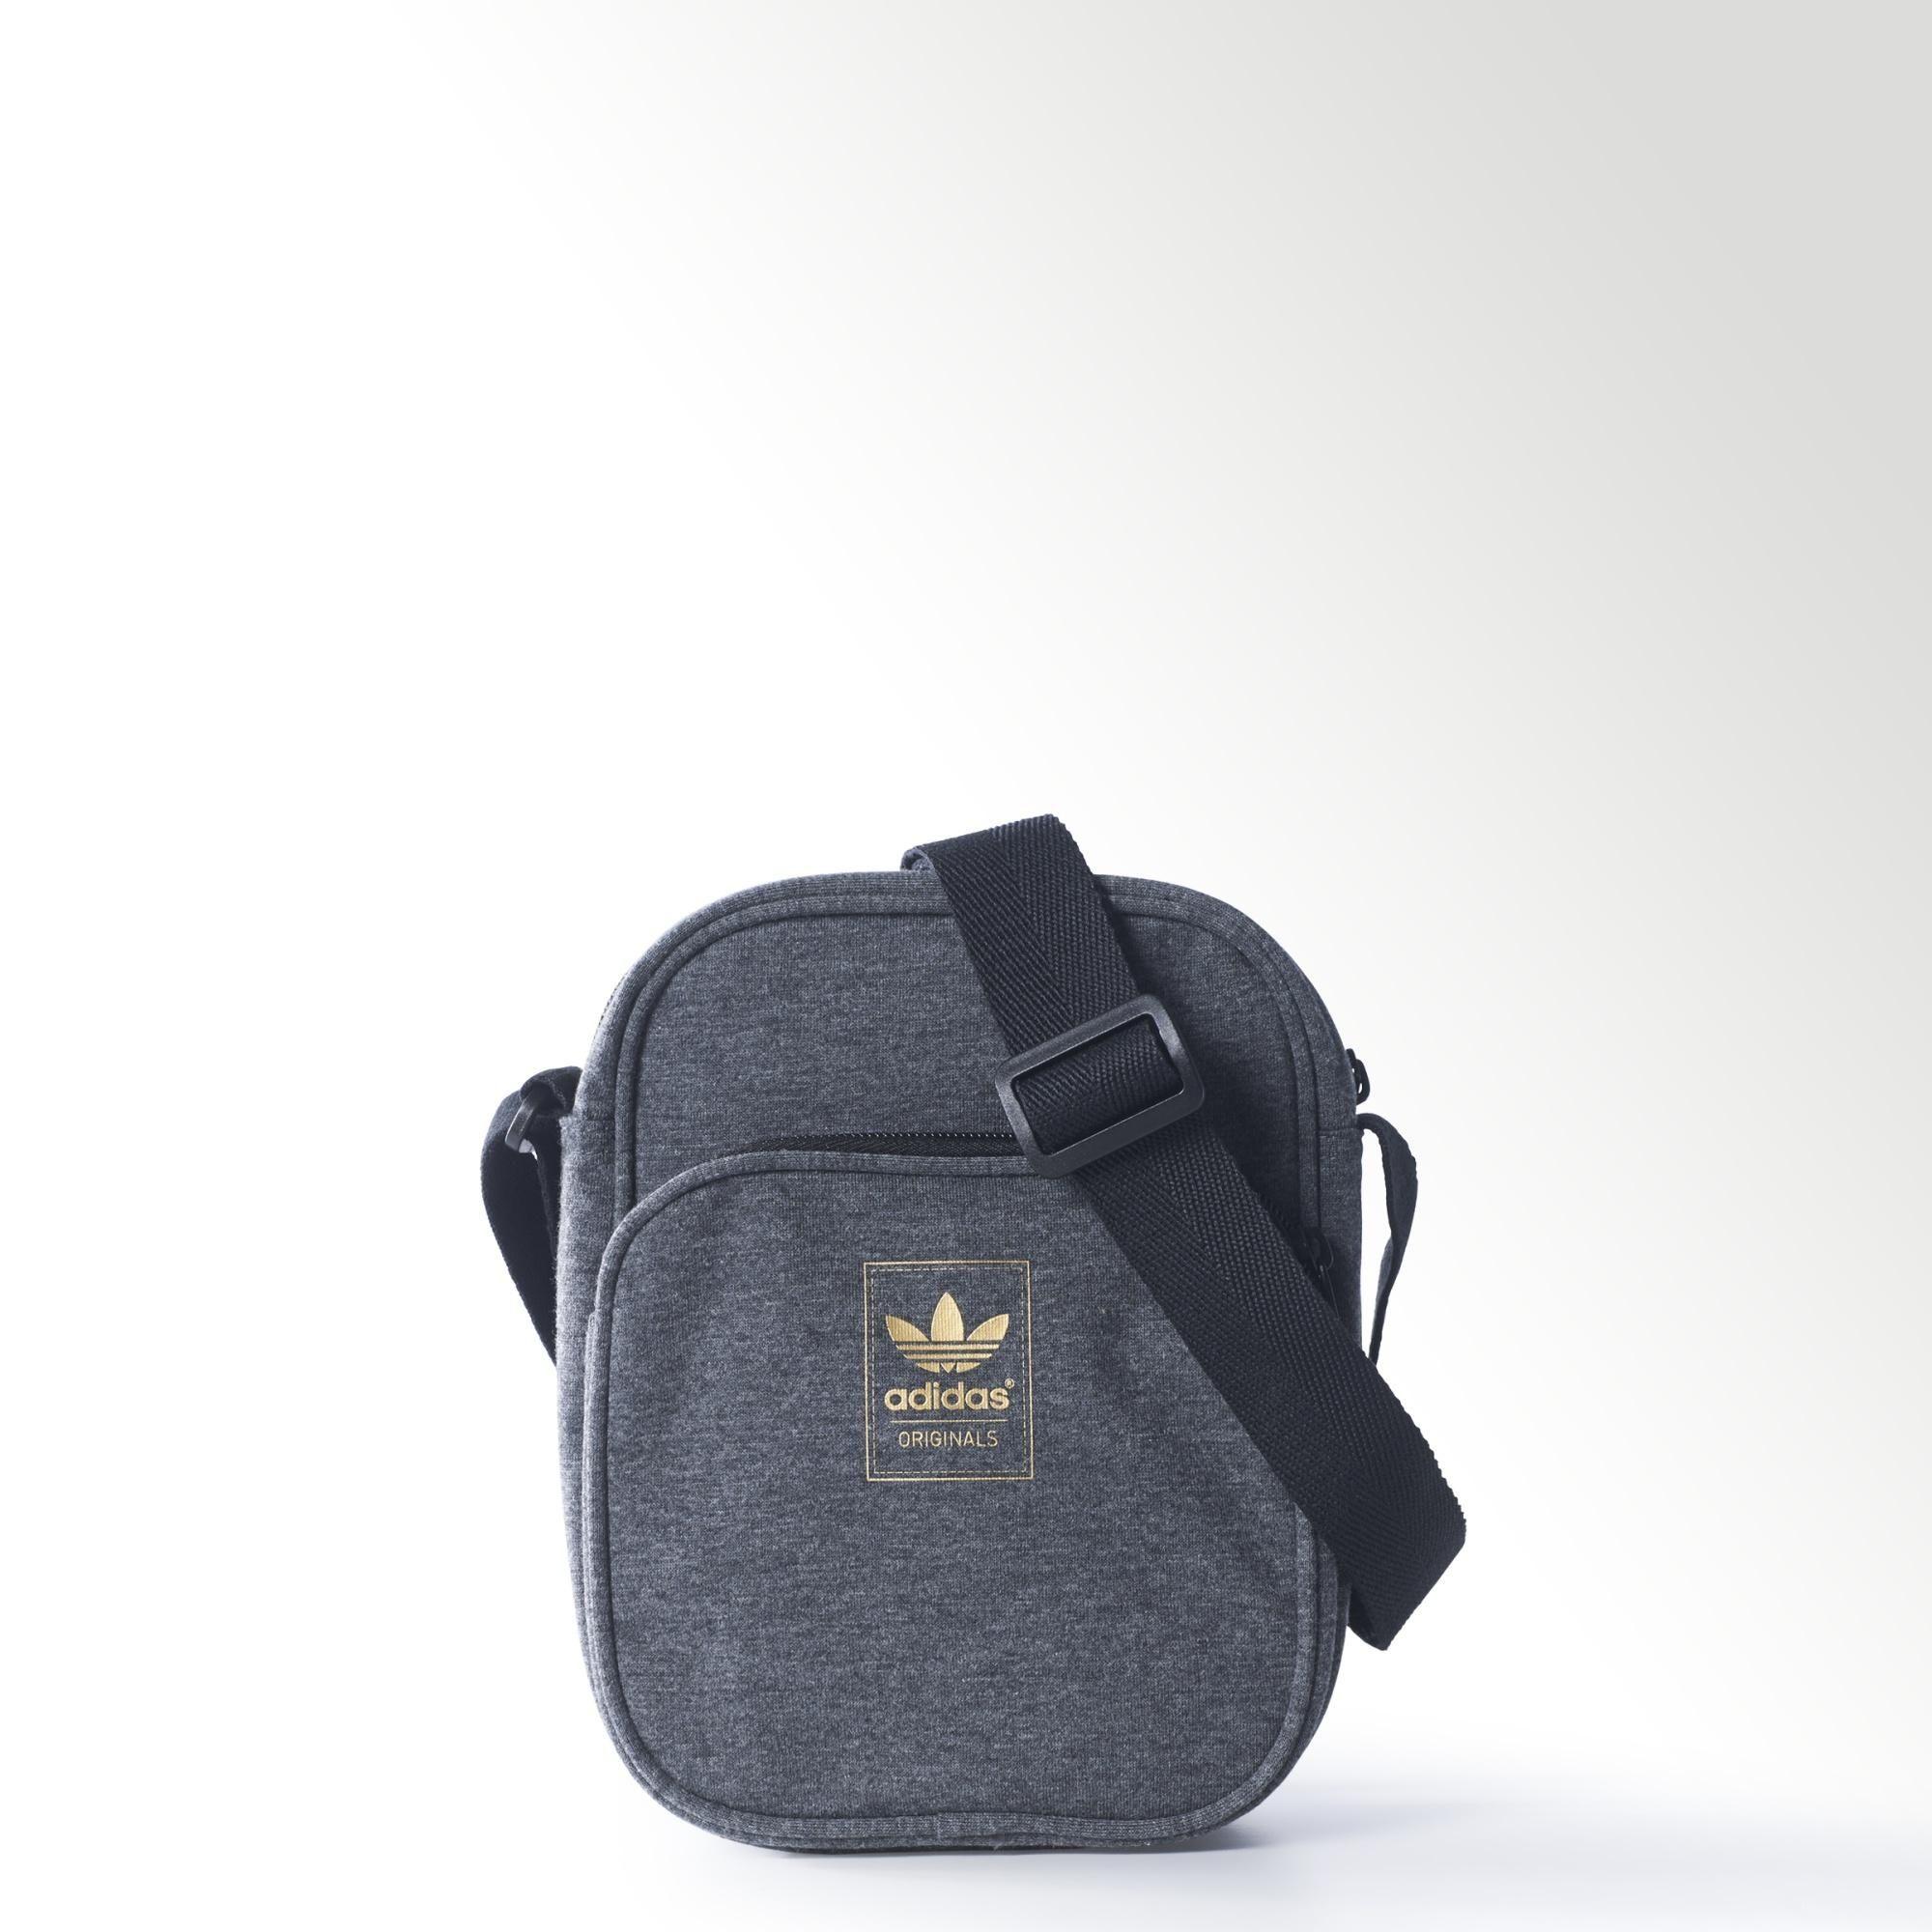 AdidasEspaña Mini Bag Jersey BagY Estilo TKJlcF31